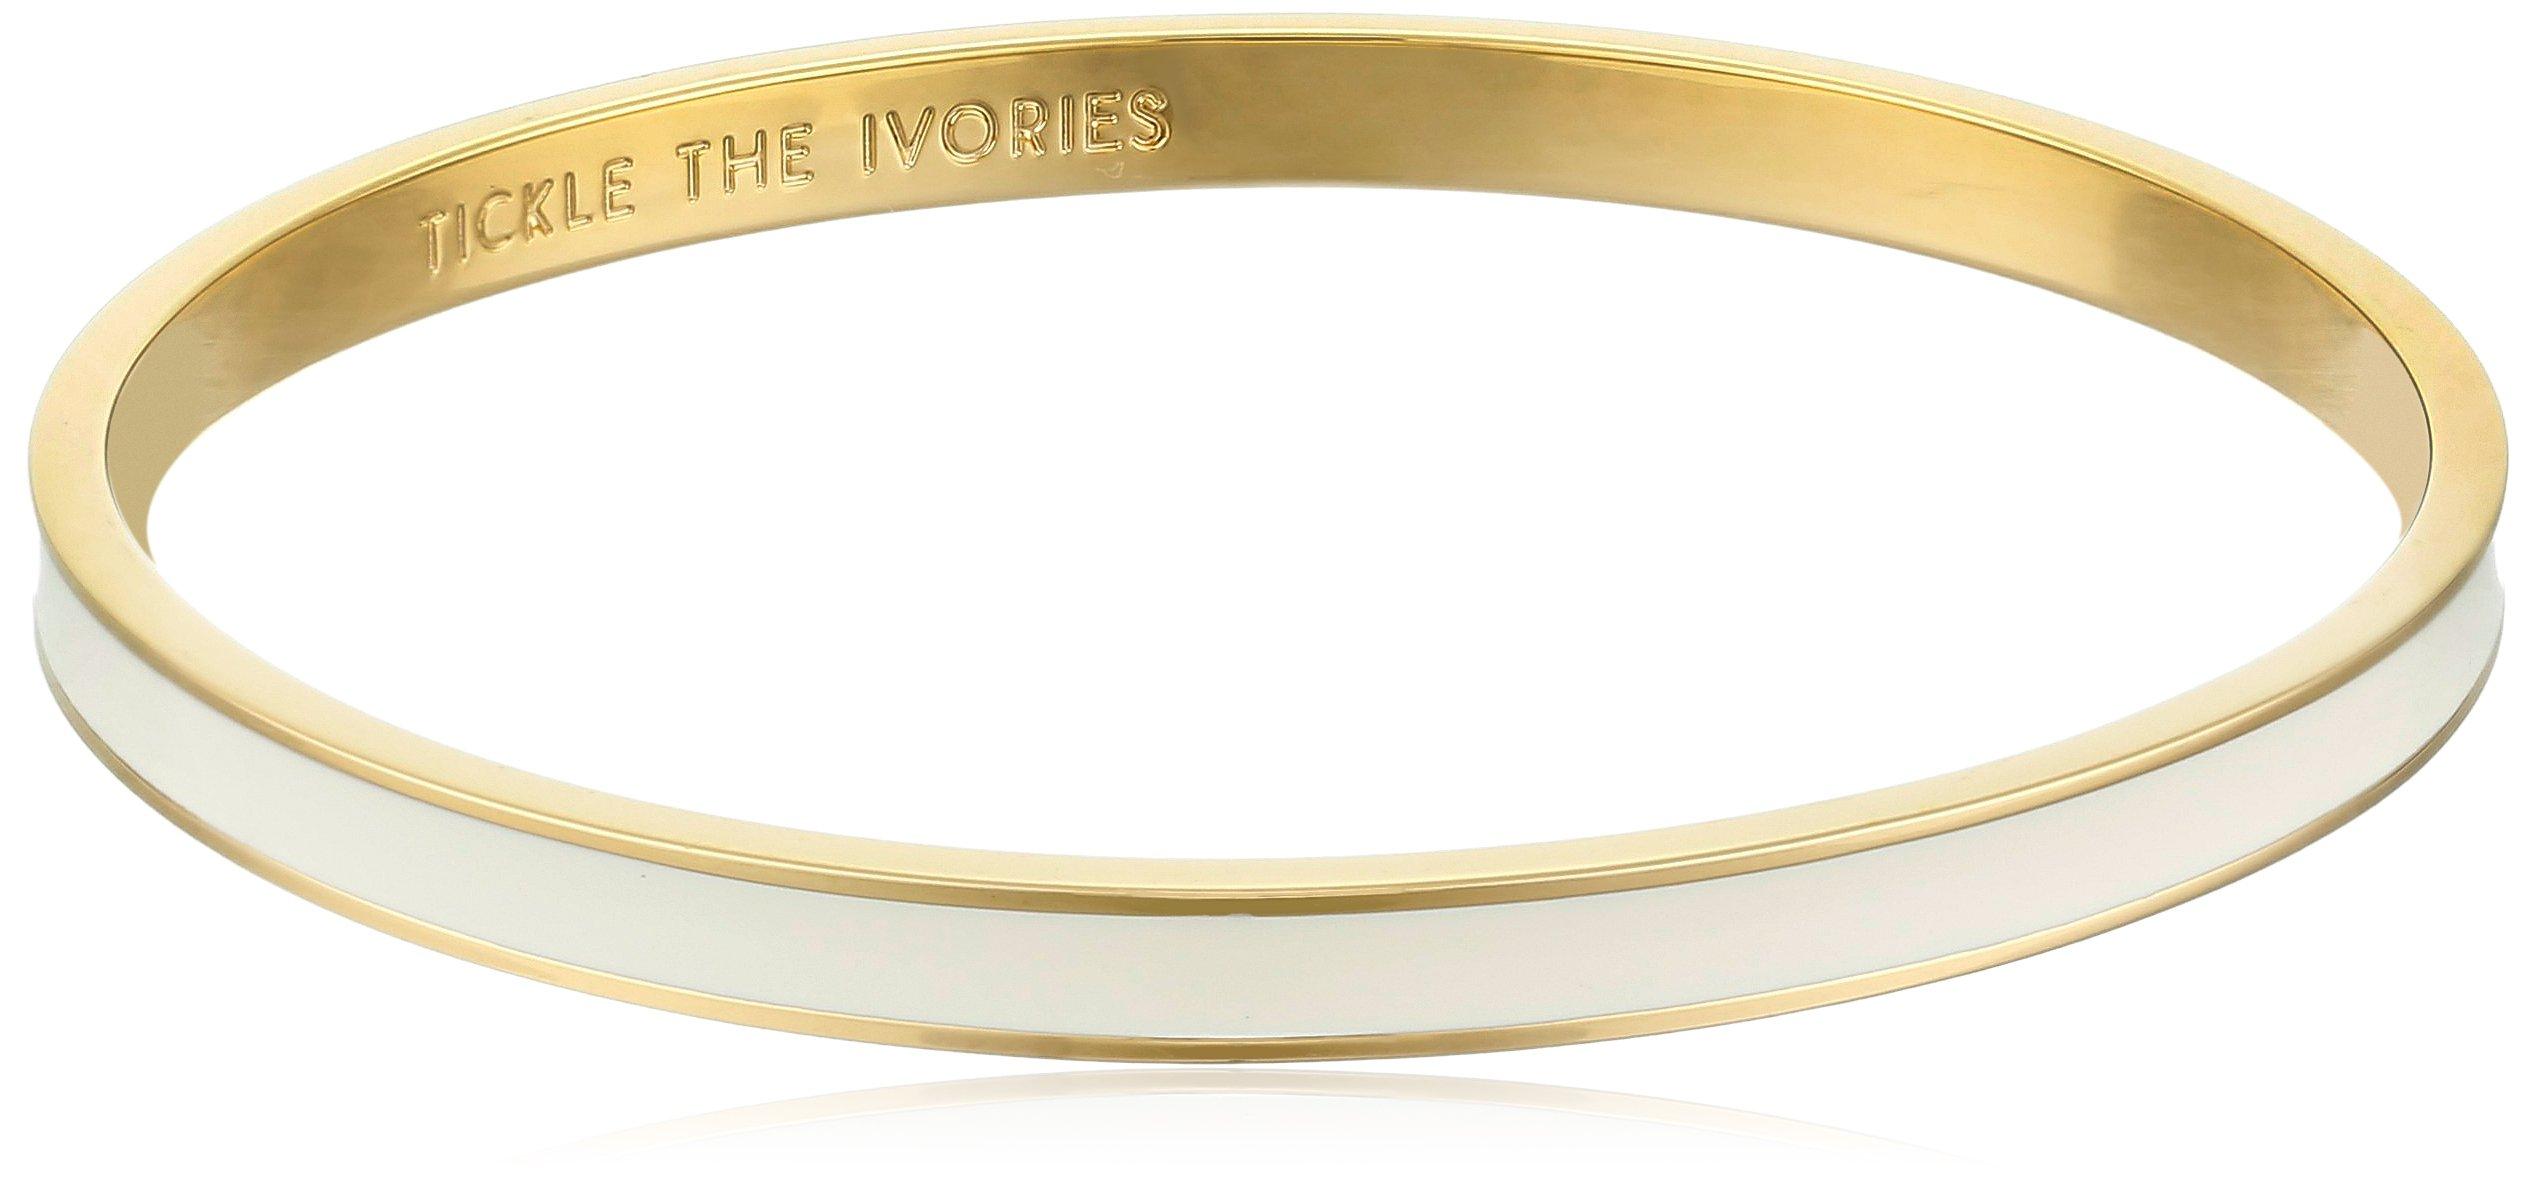 Kate Spade New York ''Tickle The Ivories Cream Idiom Bangle Bracelet